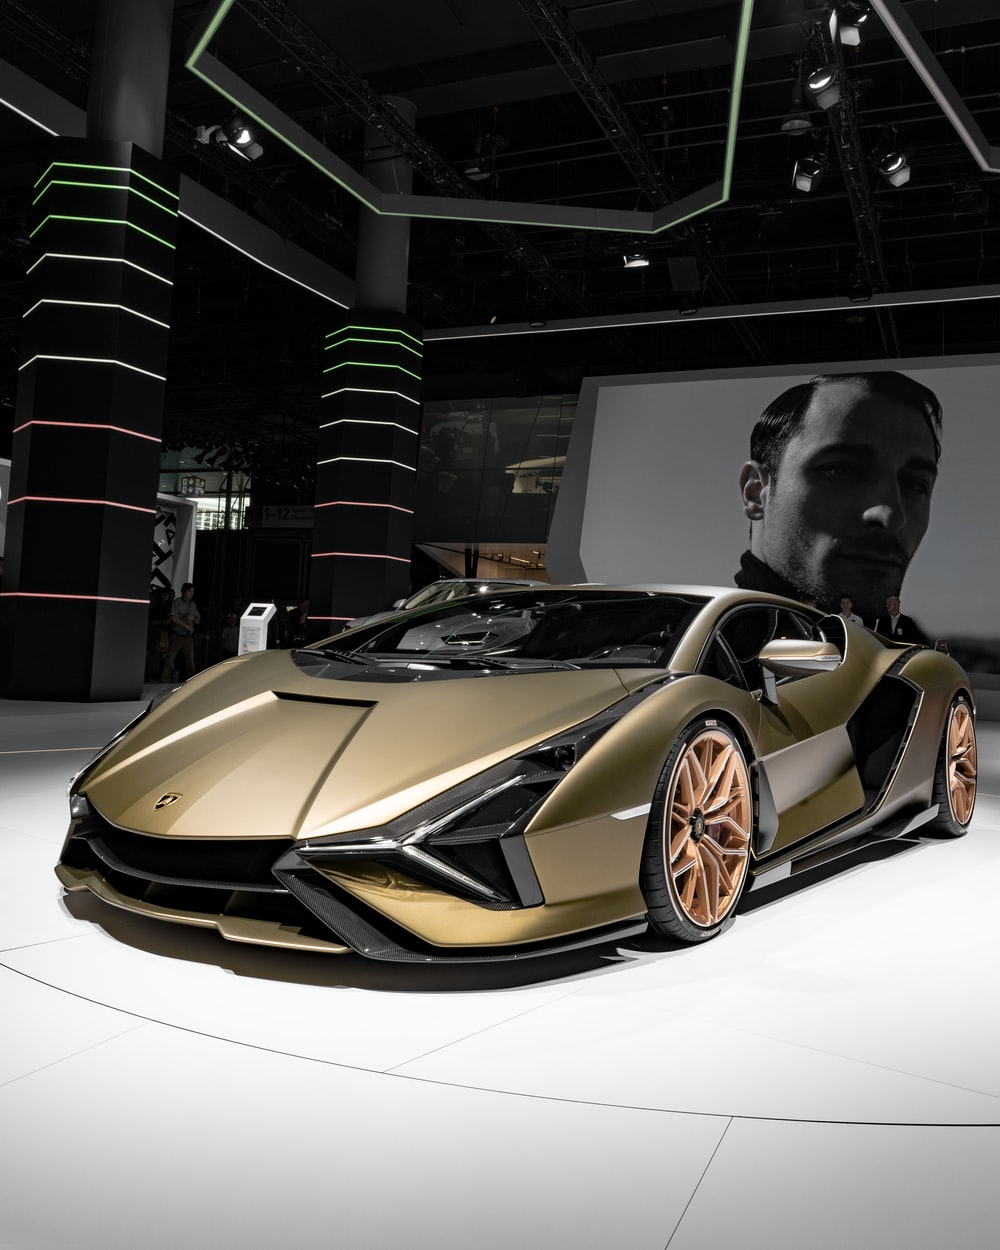 gray luxury car